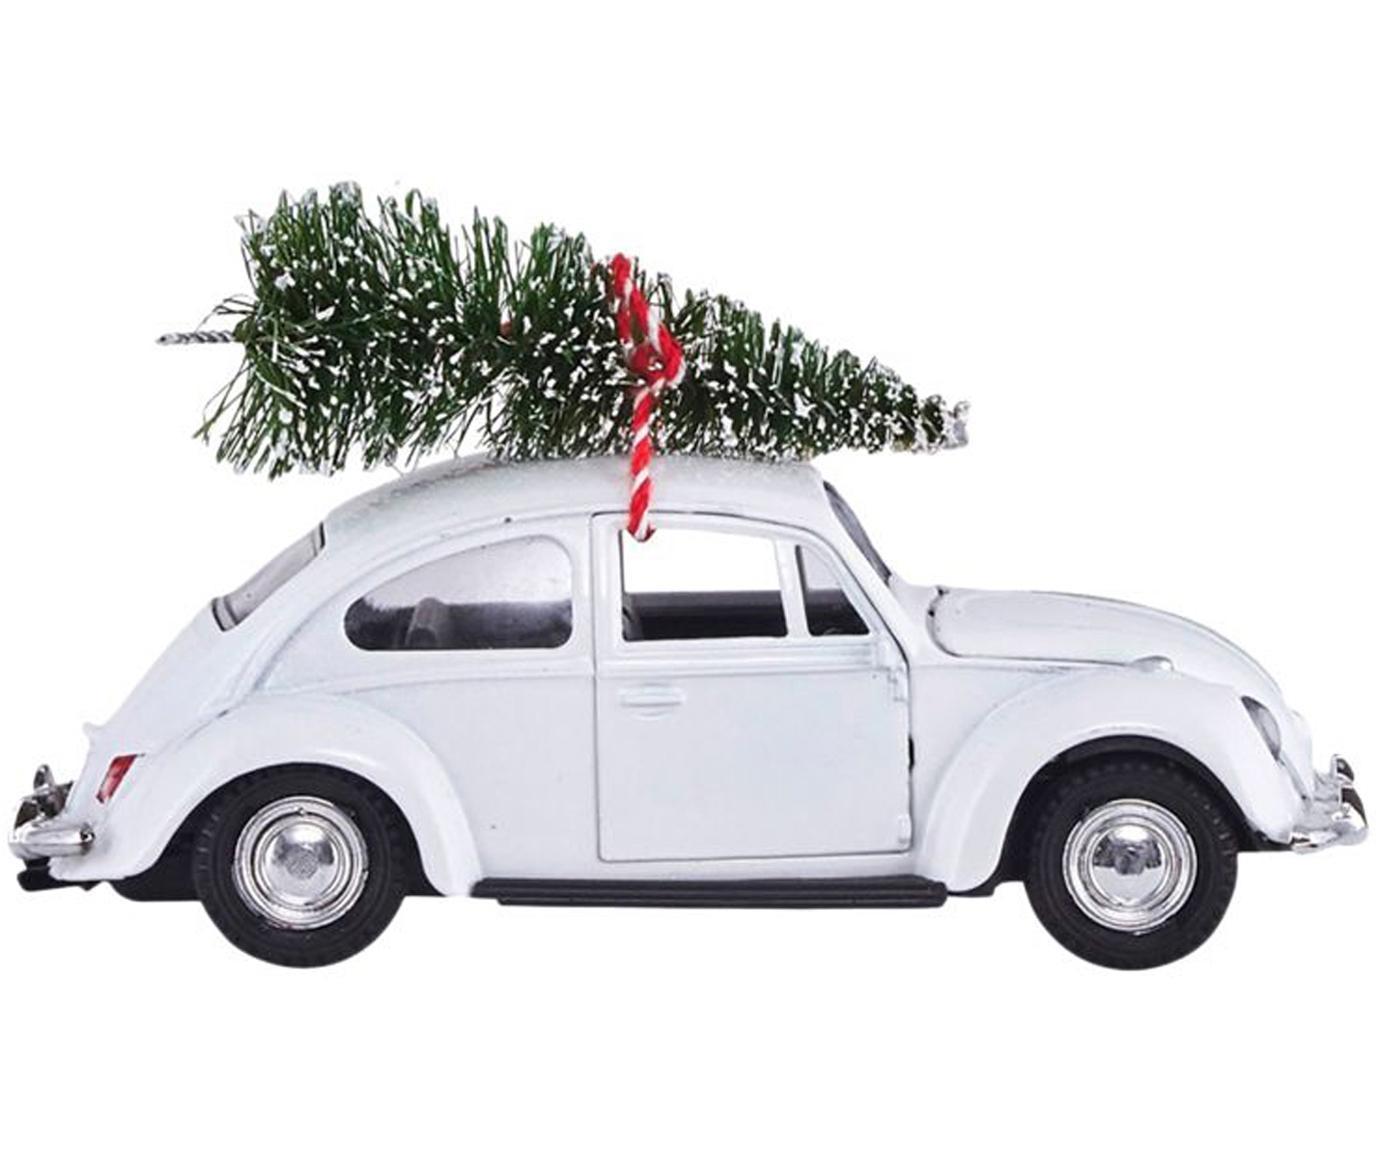 Macchina natalizia decorativa Tree Delivery, Zinco, plastica, Bianco, rosso, verde, Larg. 5 x Alt. 7 cm